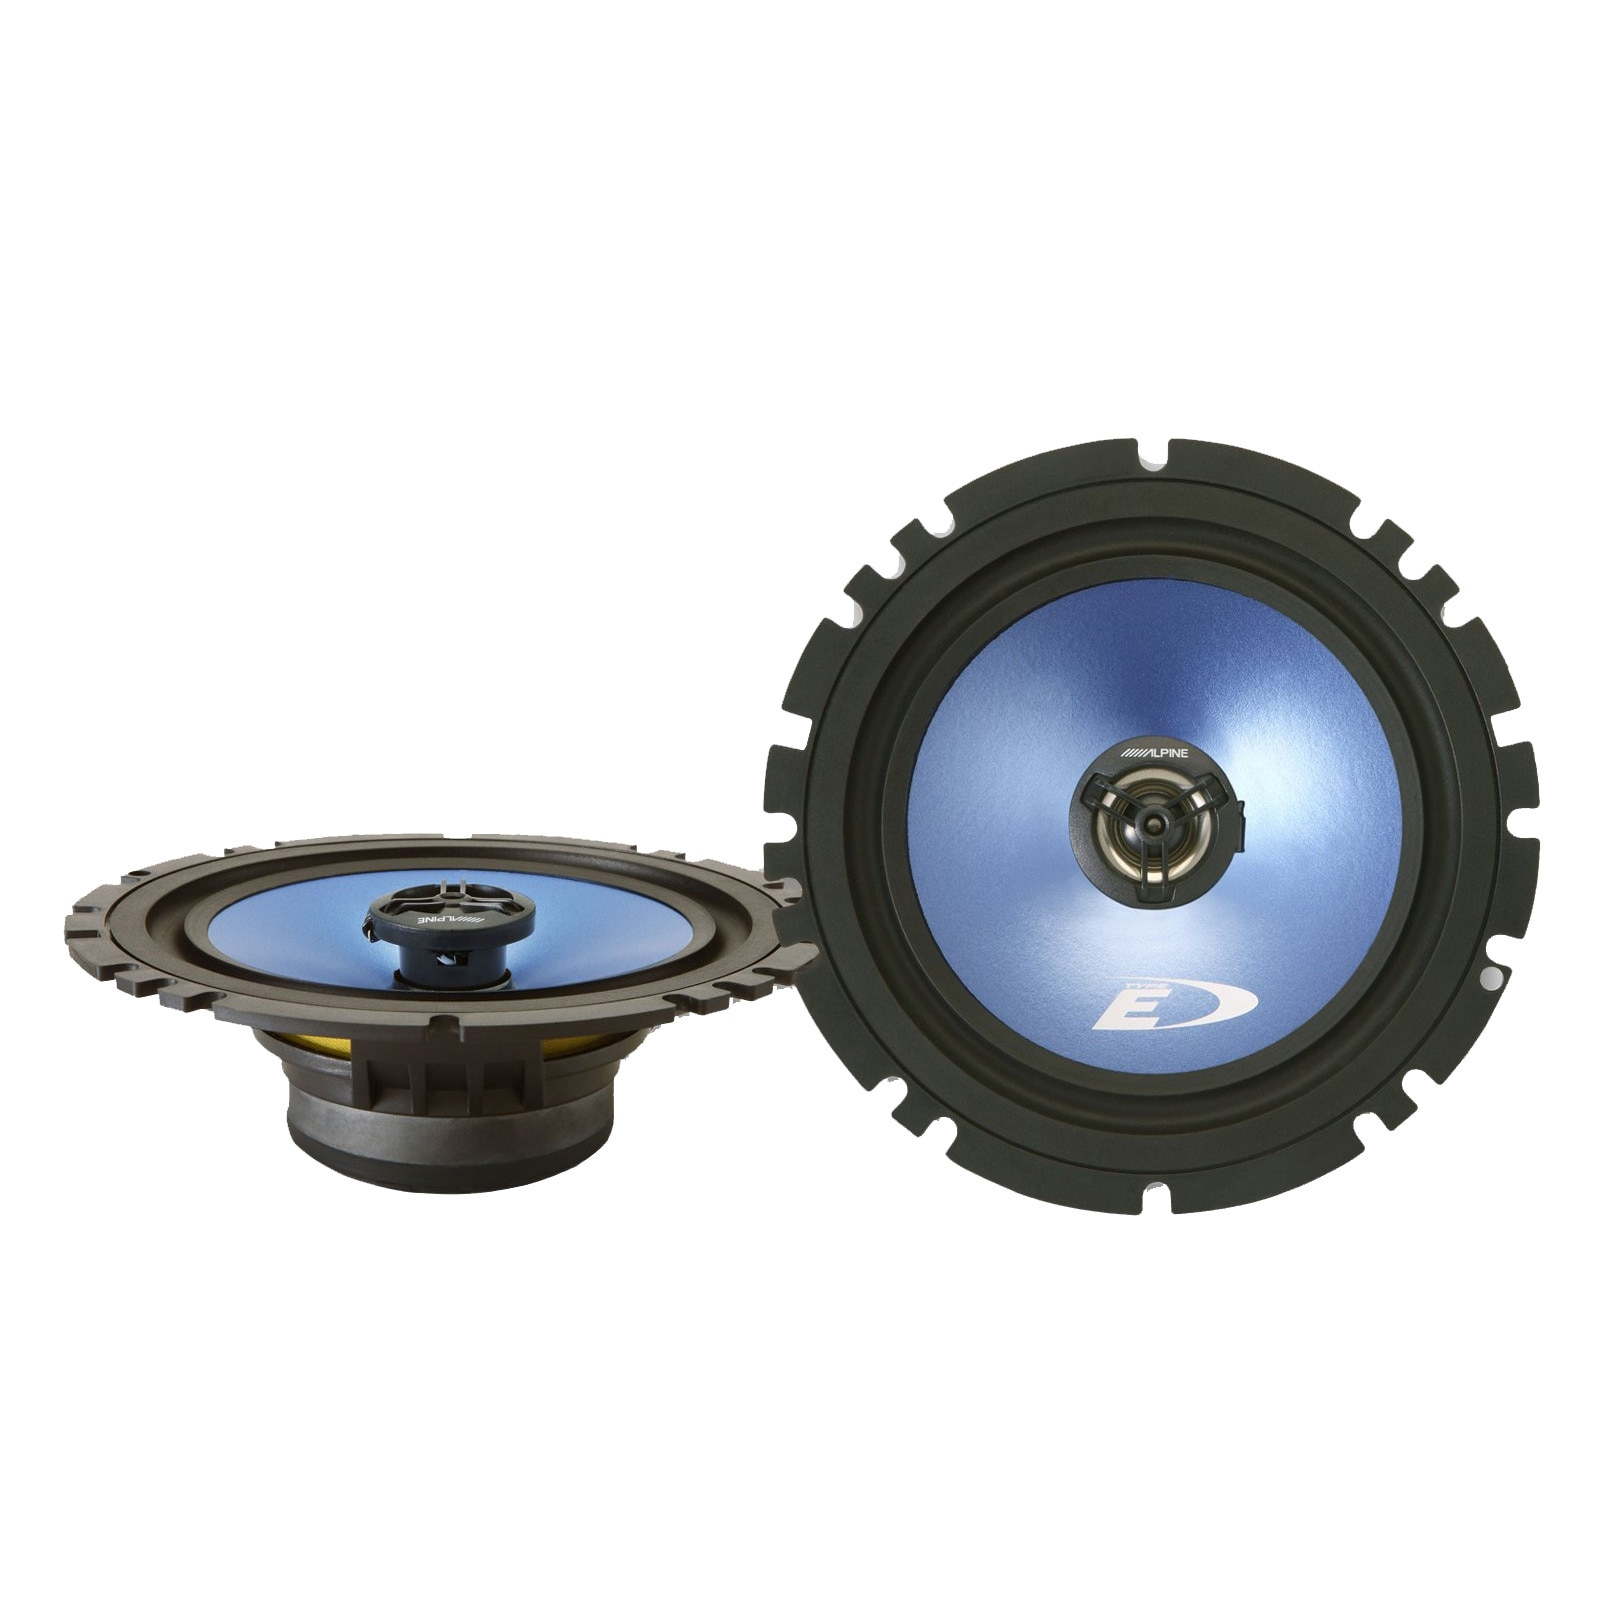 "Fotografie Set difuzoare auto coaxial Alpine SXE-Blue, SXE-17C2, 6-1/2"" (16.5 cm), 2 cai, 240W, 40W RMS"